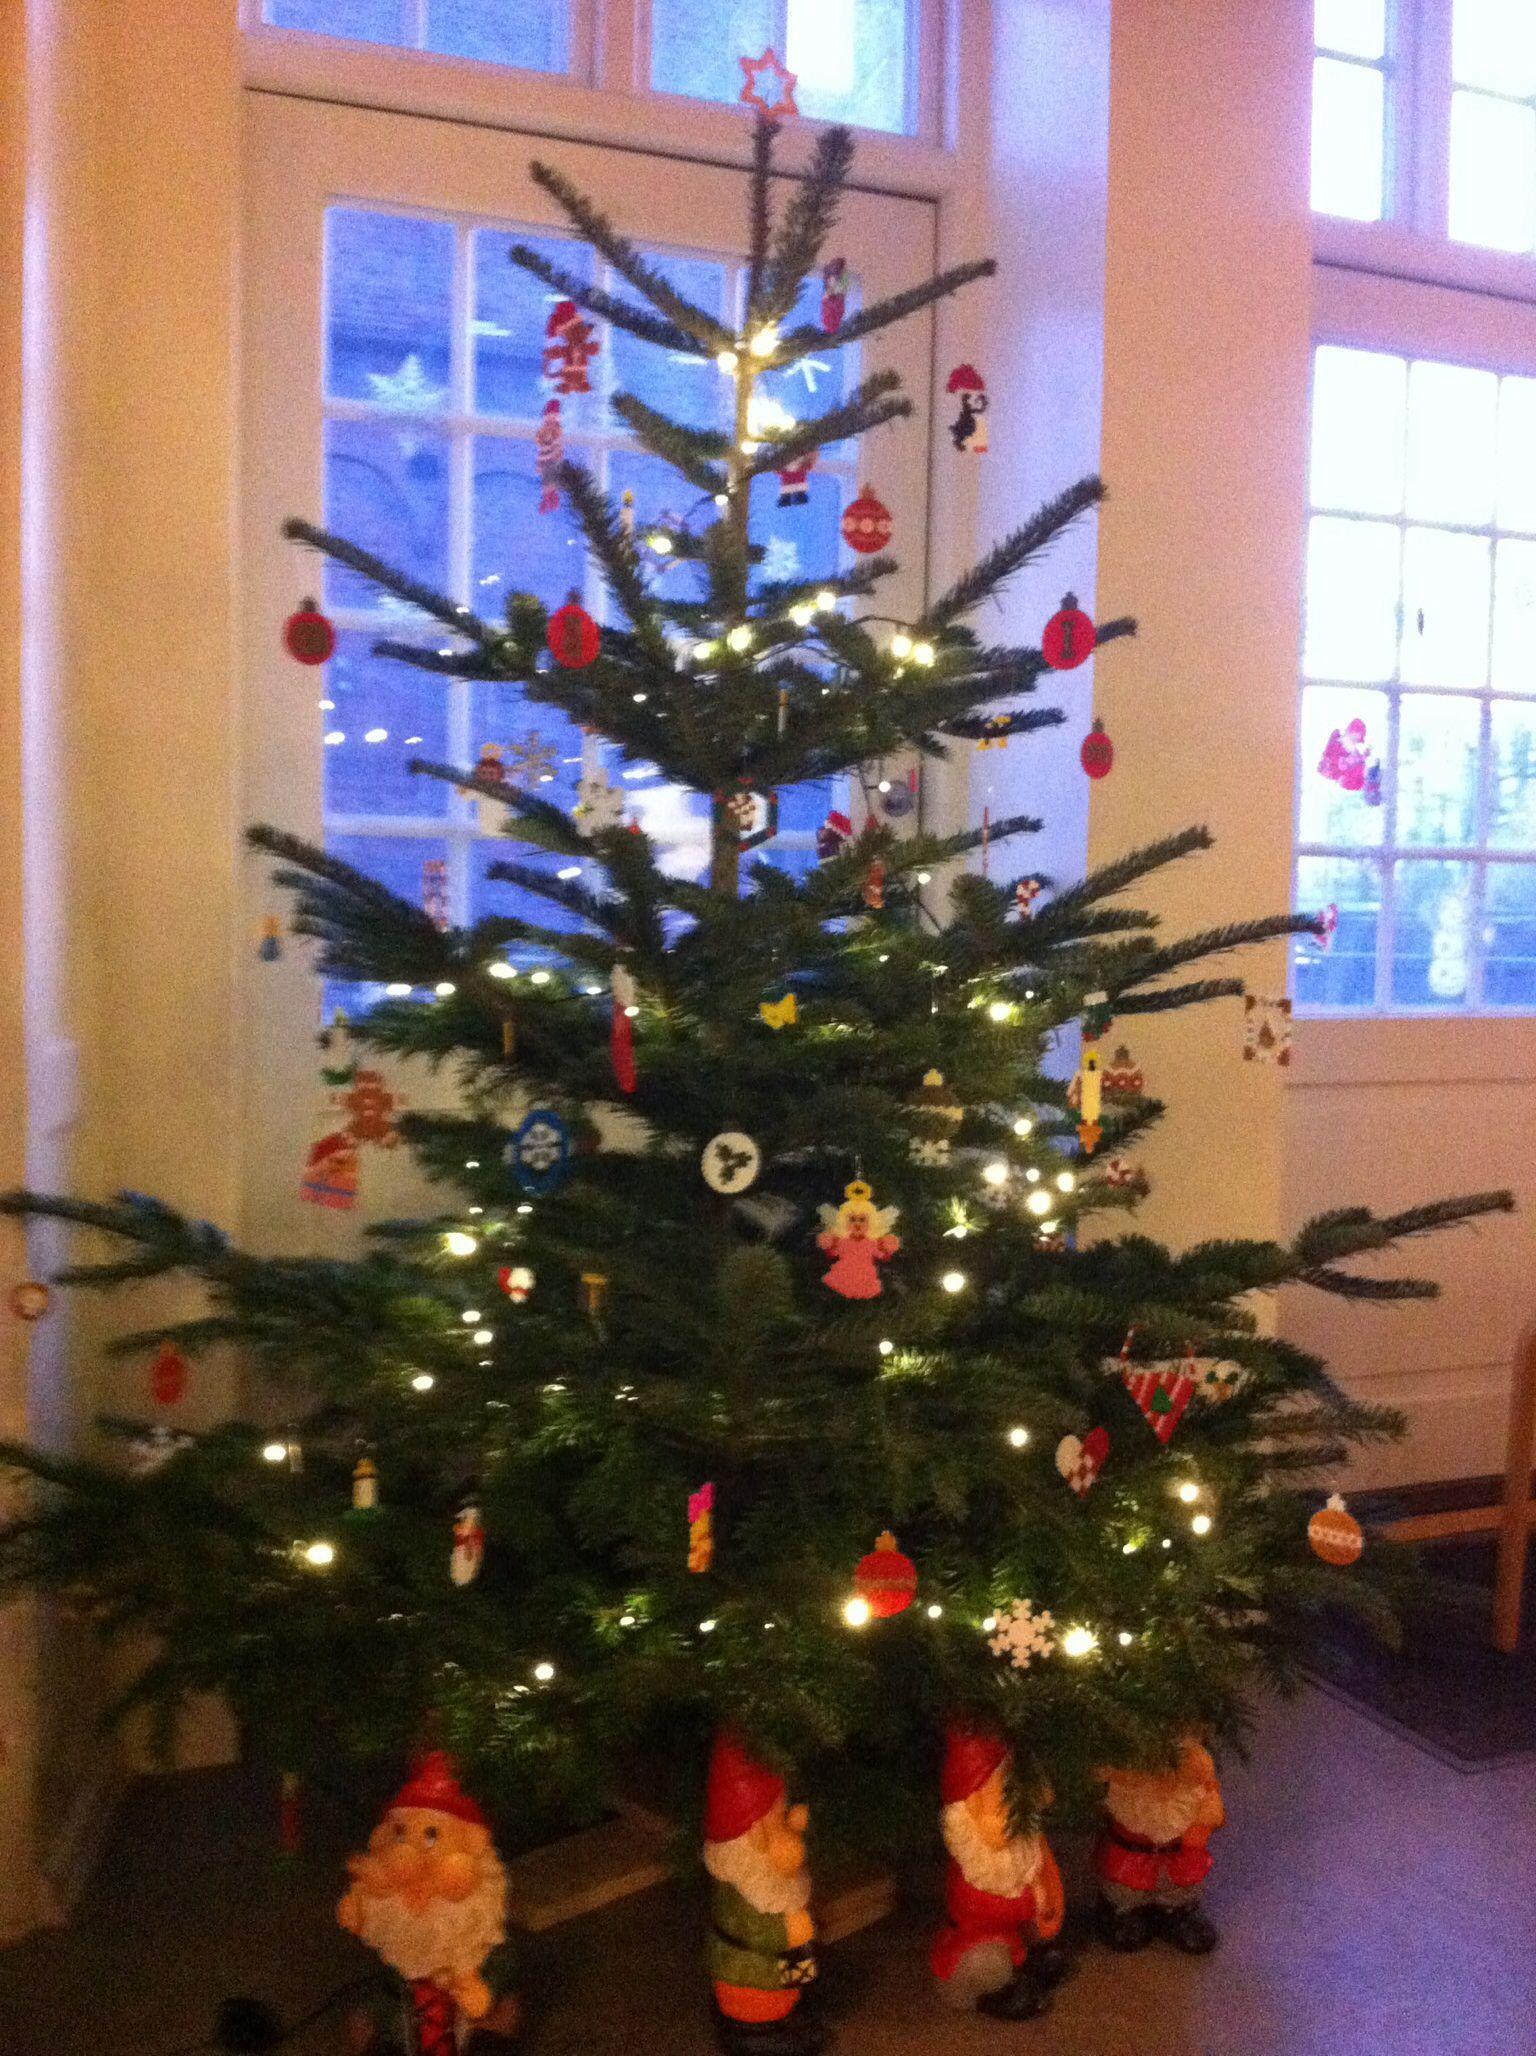 Juletræ med hama perle pynt